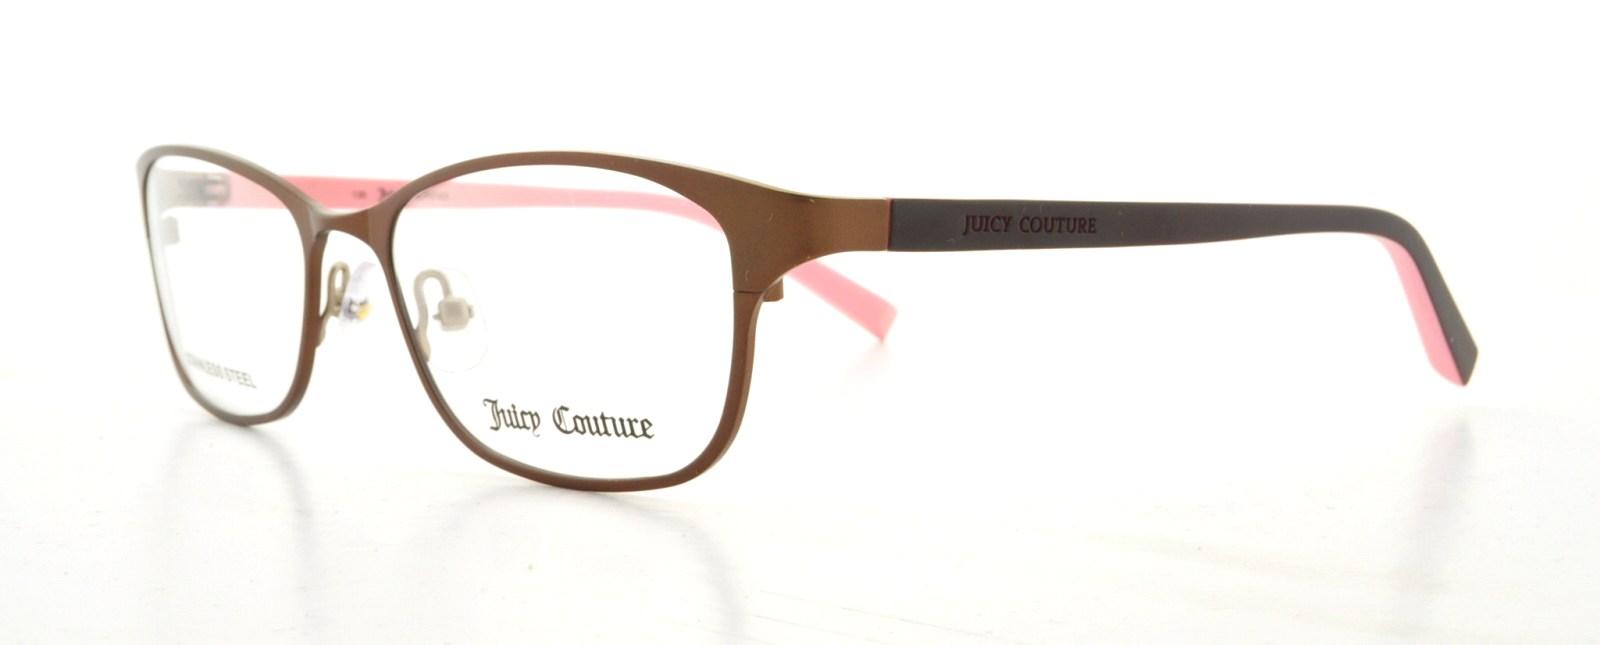 cdf0ea9748a Designer Frames Outlet. Juicy Couture 109